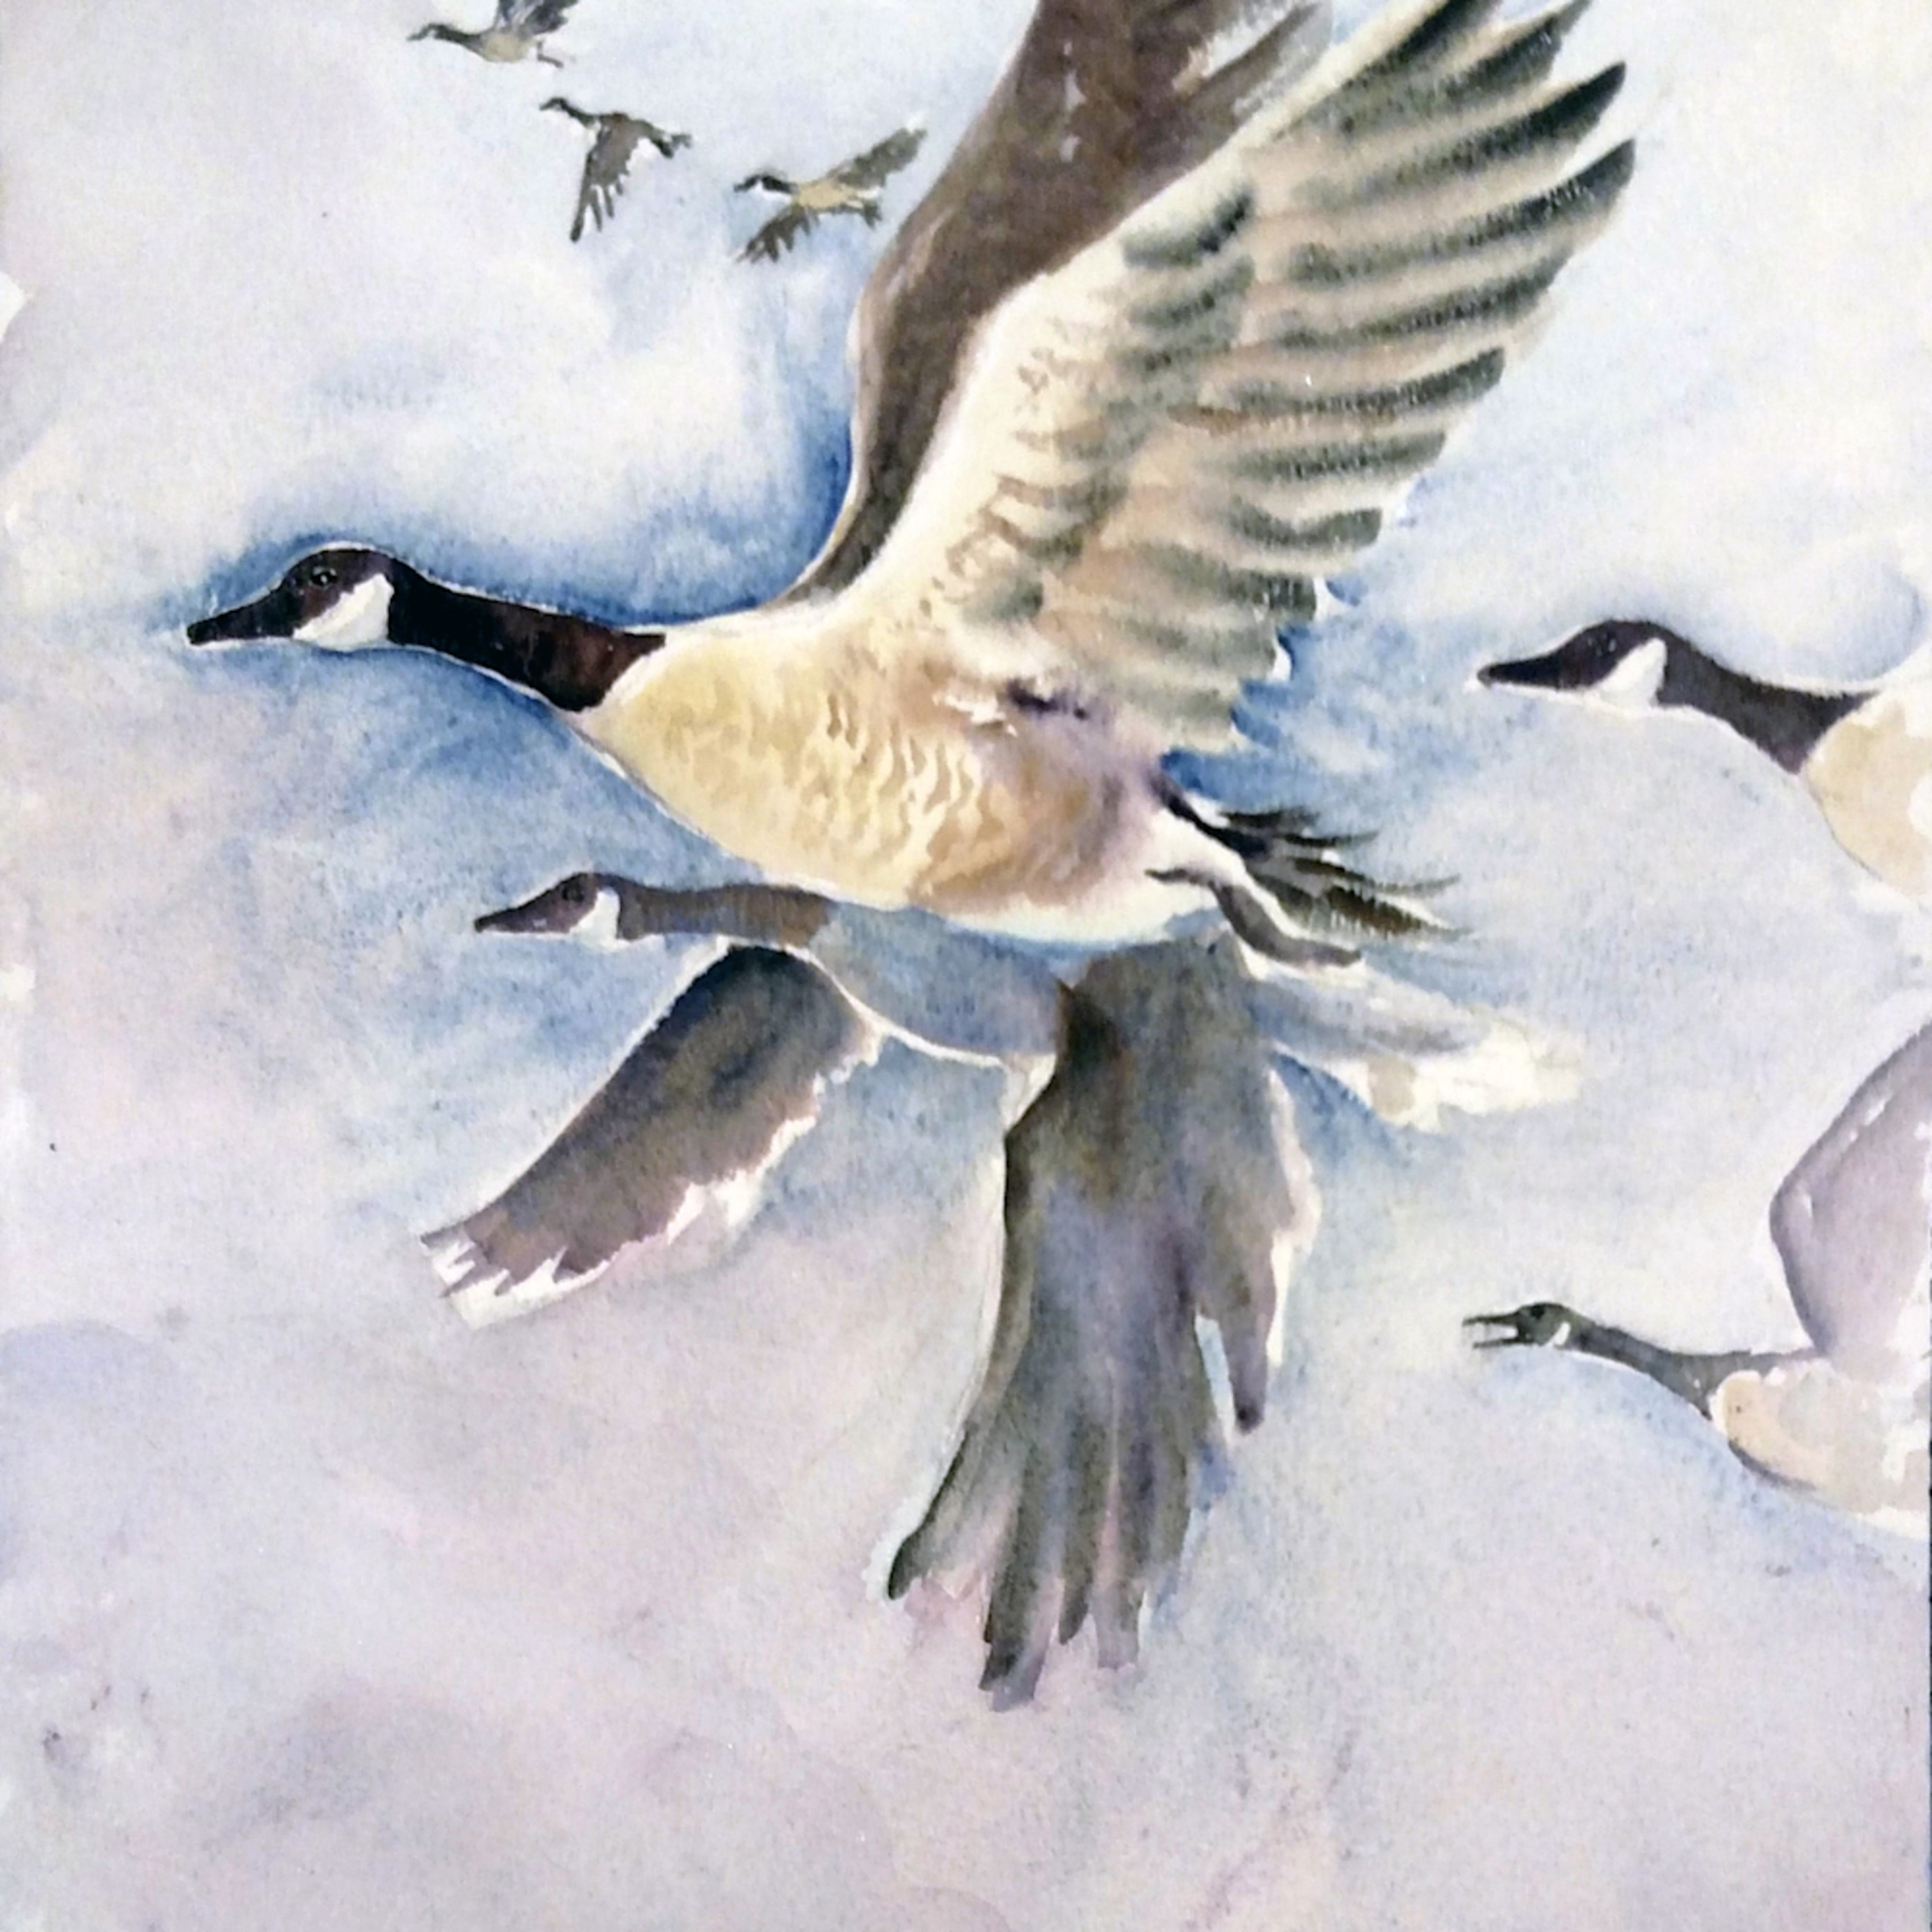 Flying geese de5juj